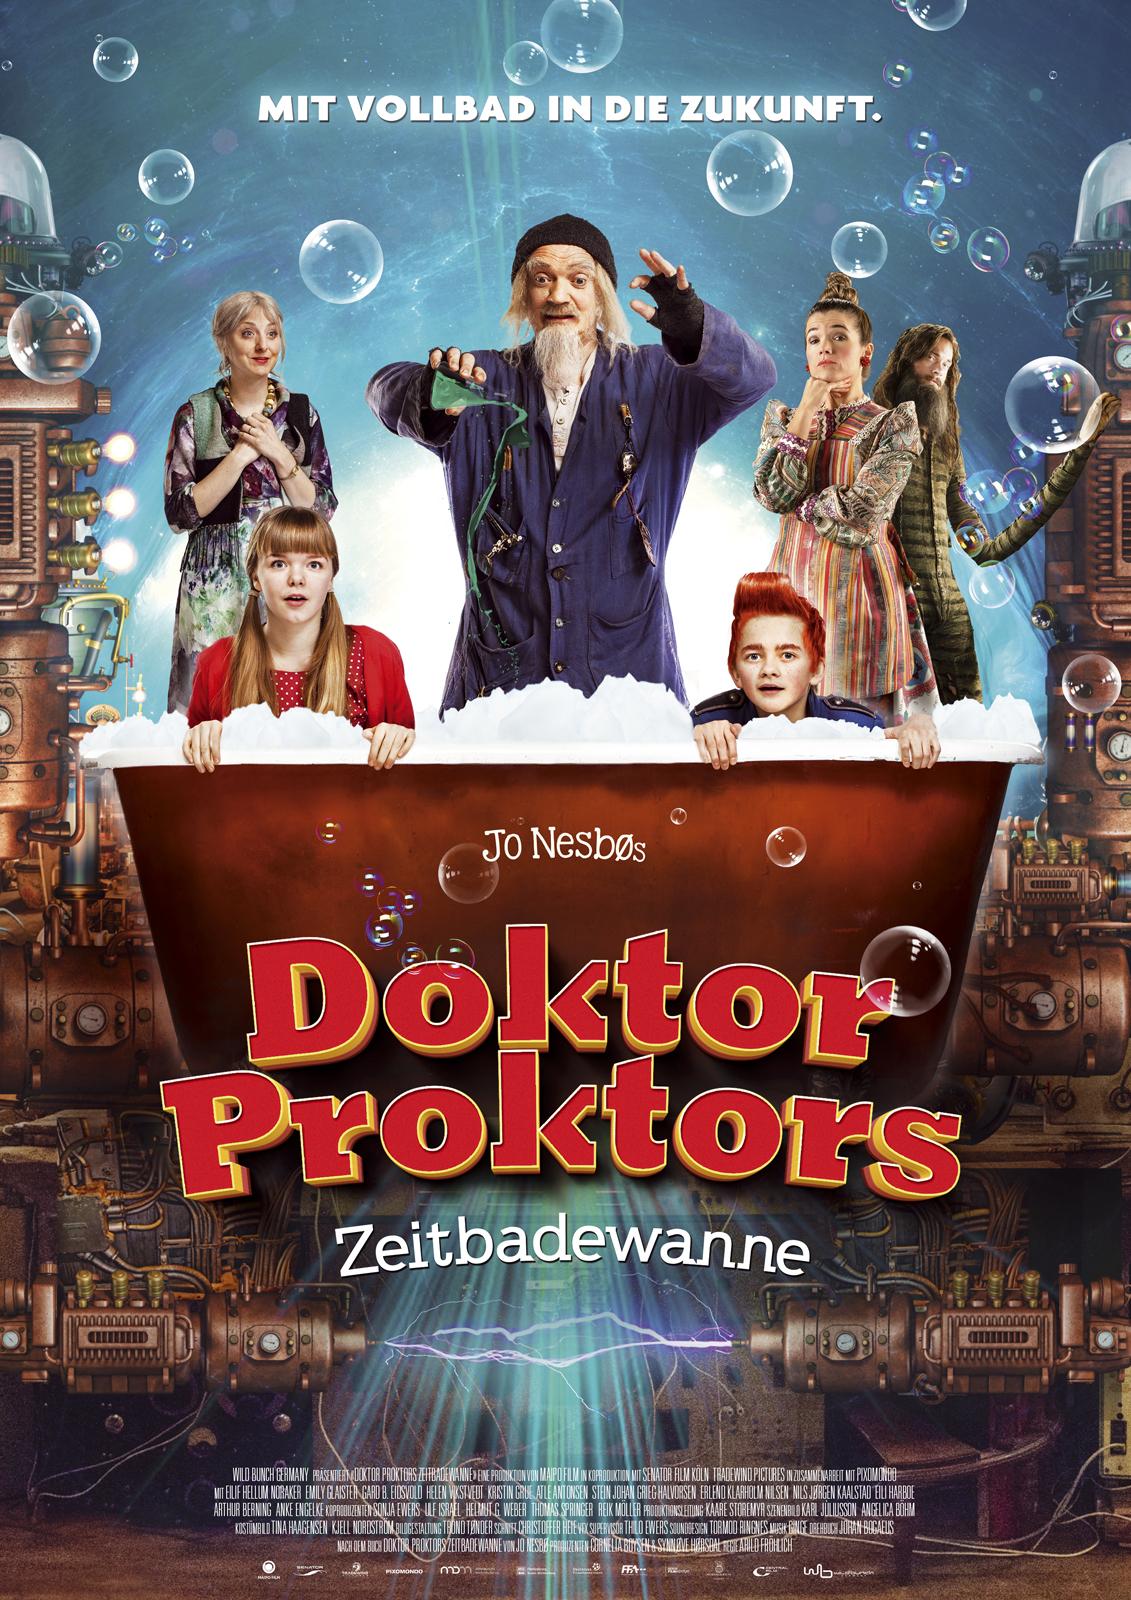 Doktor Proktors Zeitbadewanne Film 2016 Filmstarts De